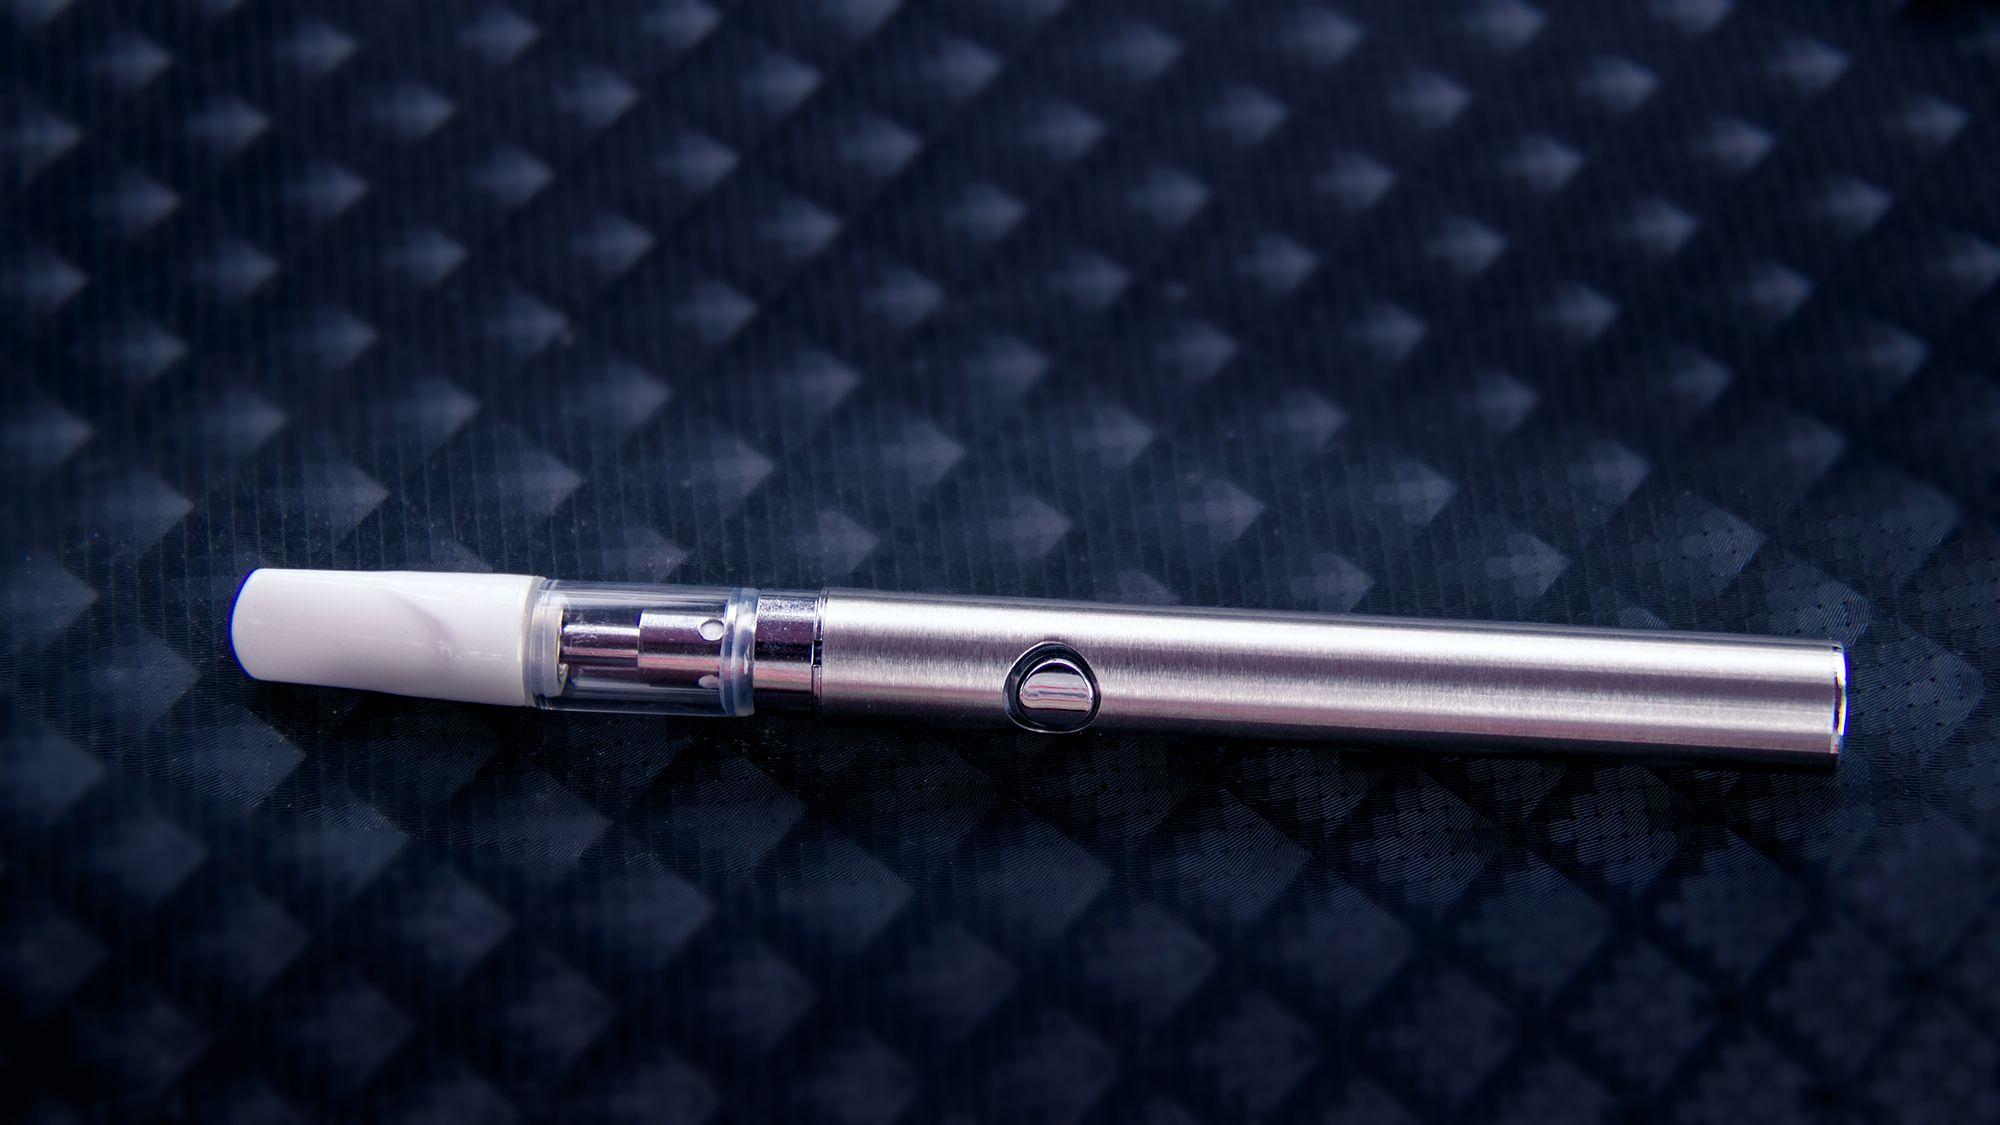 Ceramic Drip Tip Wax Cbd Pen Pen Cbd Wax